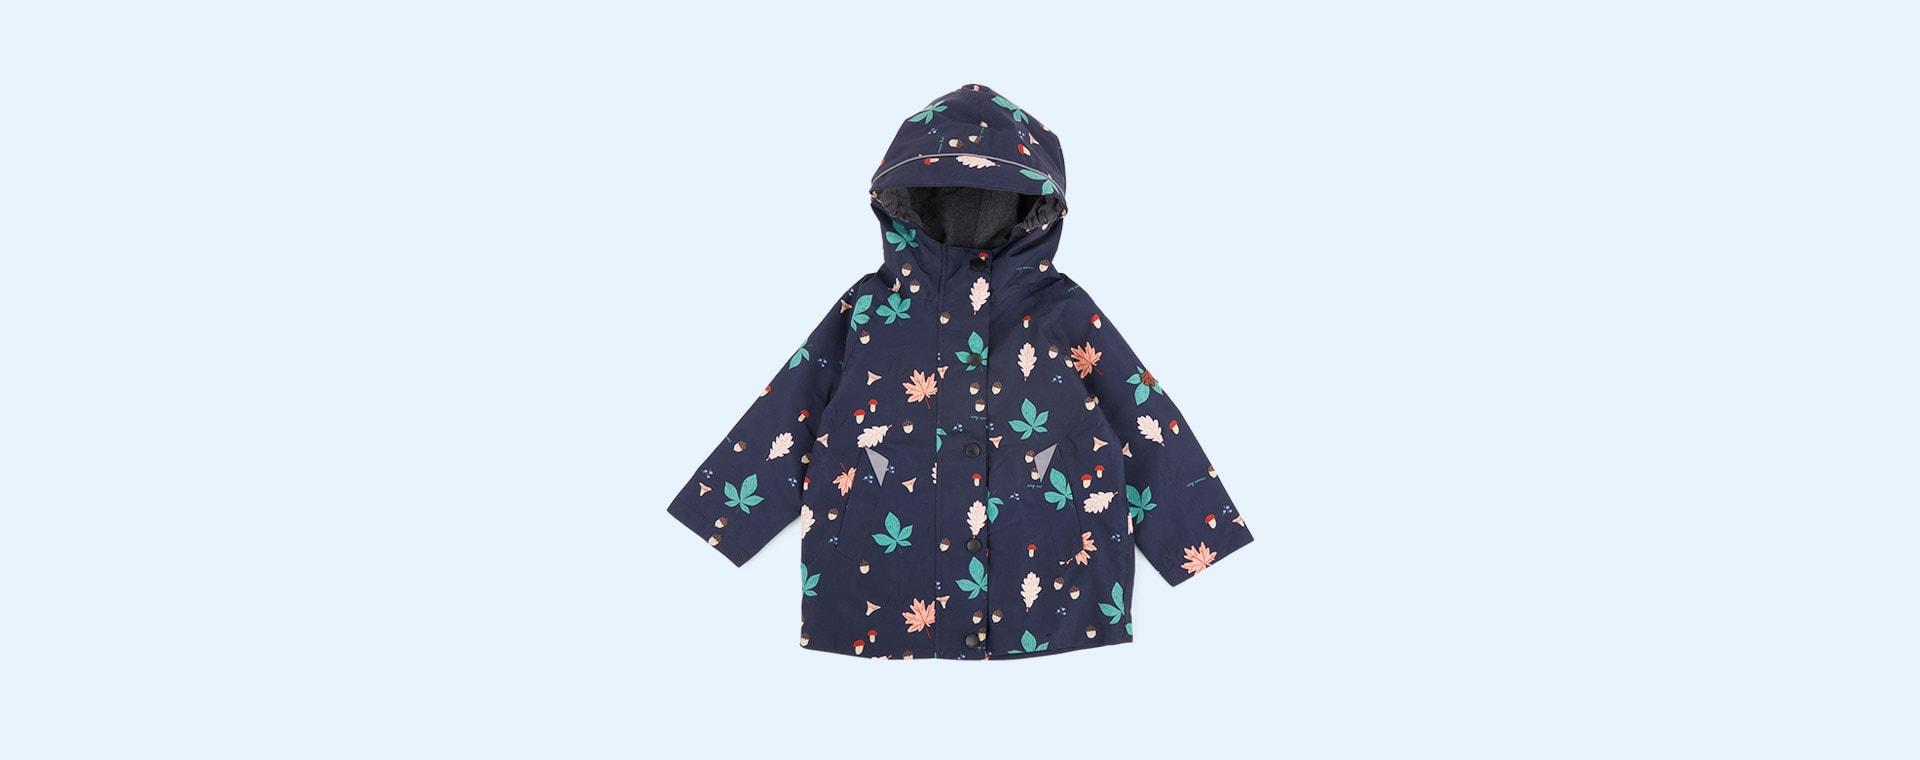 Wild Woodland Print Töastie Kids Recycled Waterproof Raincoat